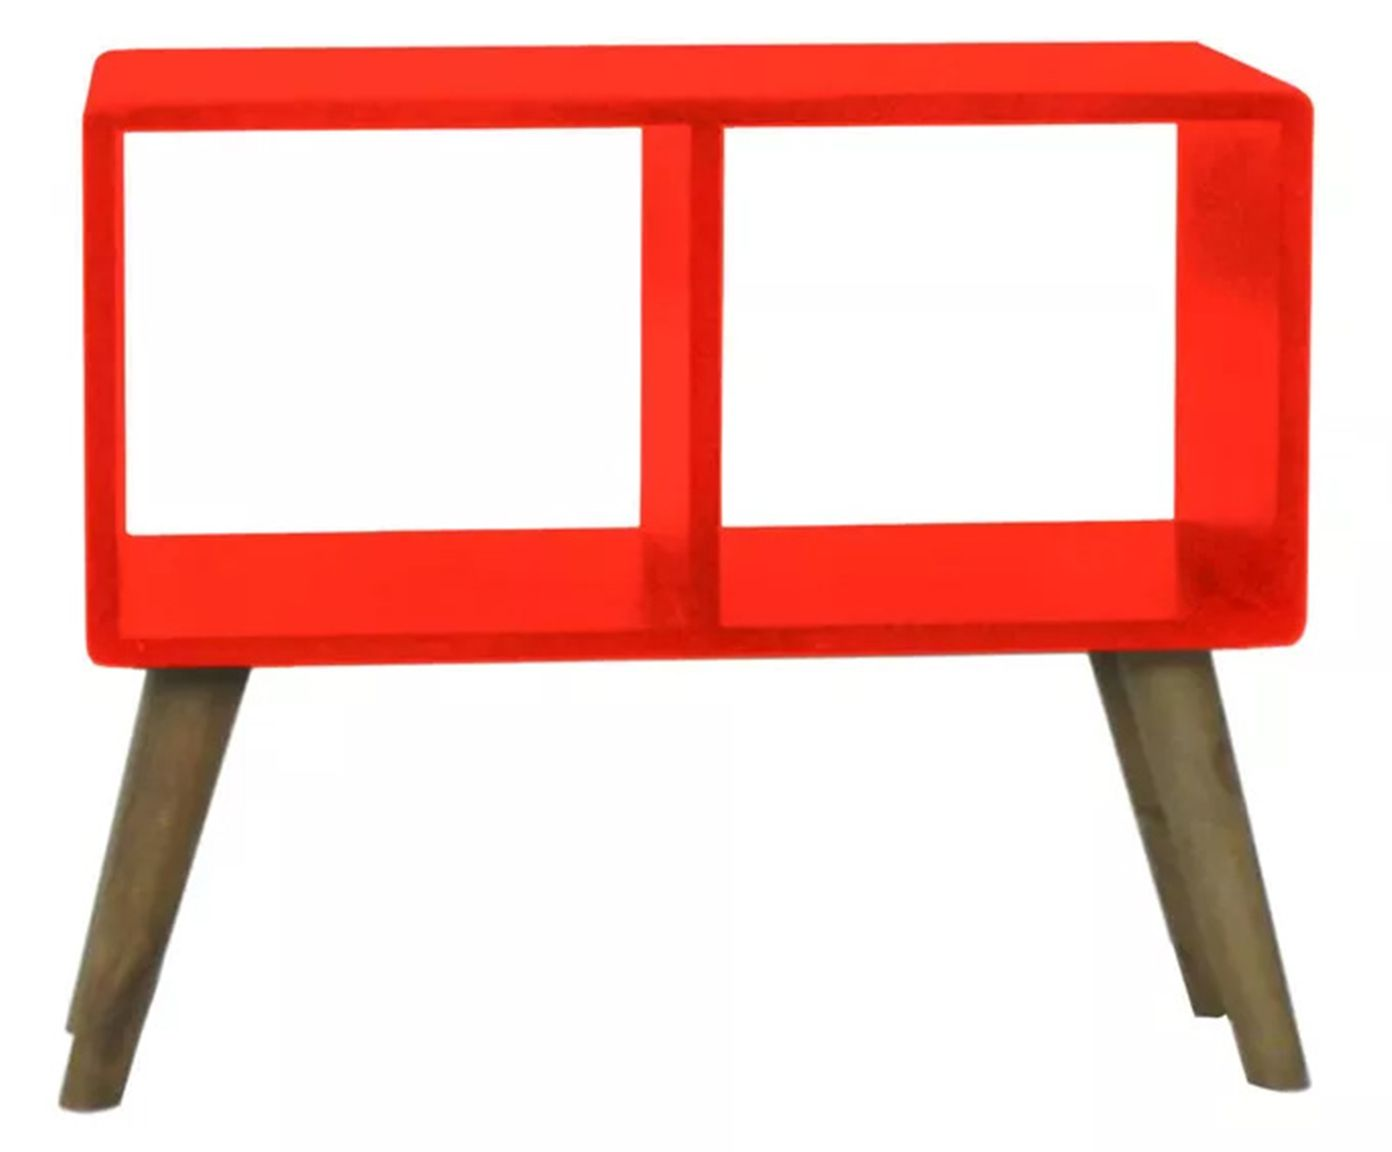 Mesa Lateral Retrô Senise Ging Vermelha - 58X50X27cm | Westwing.com.br